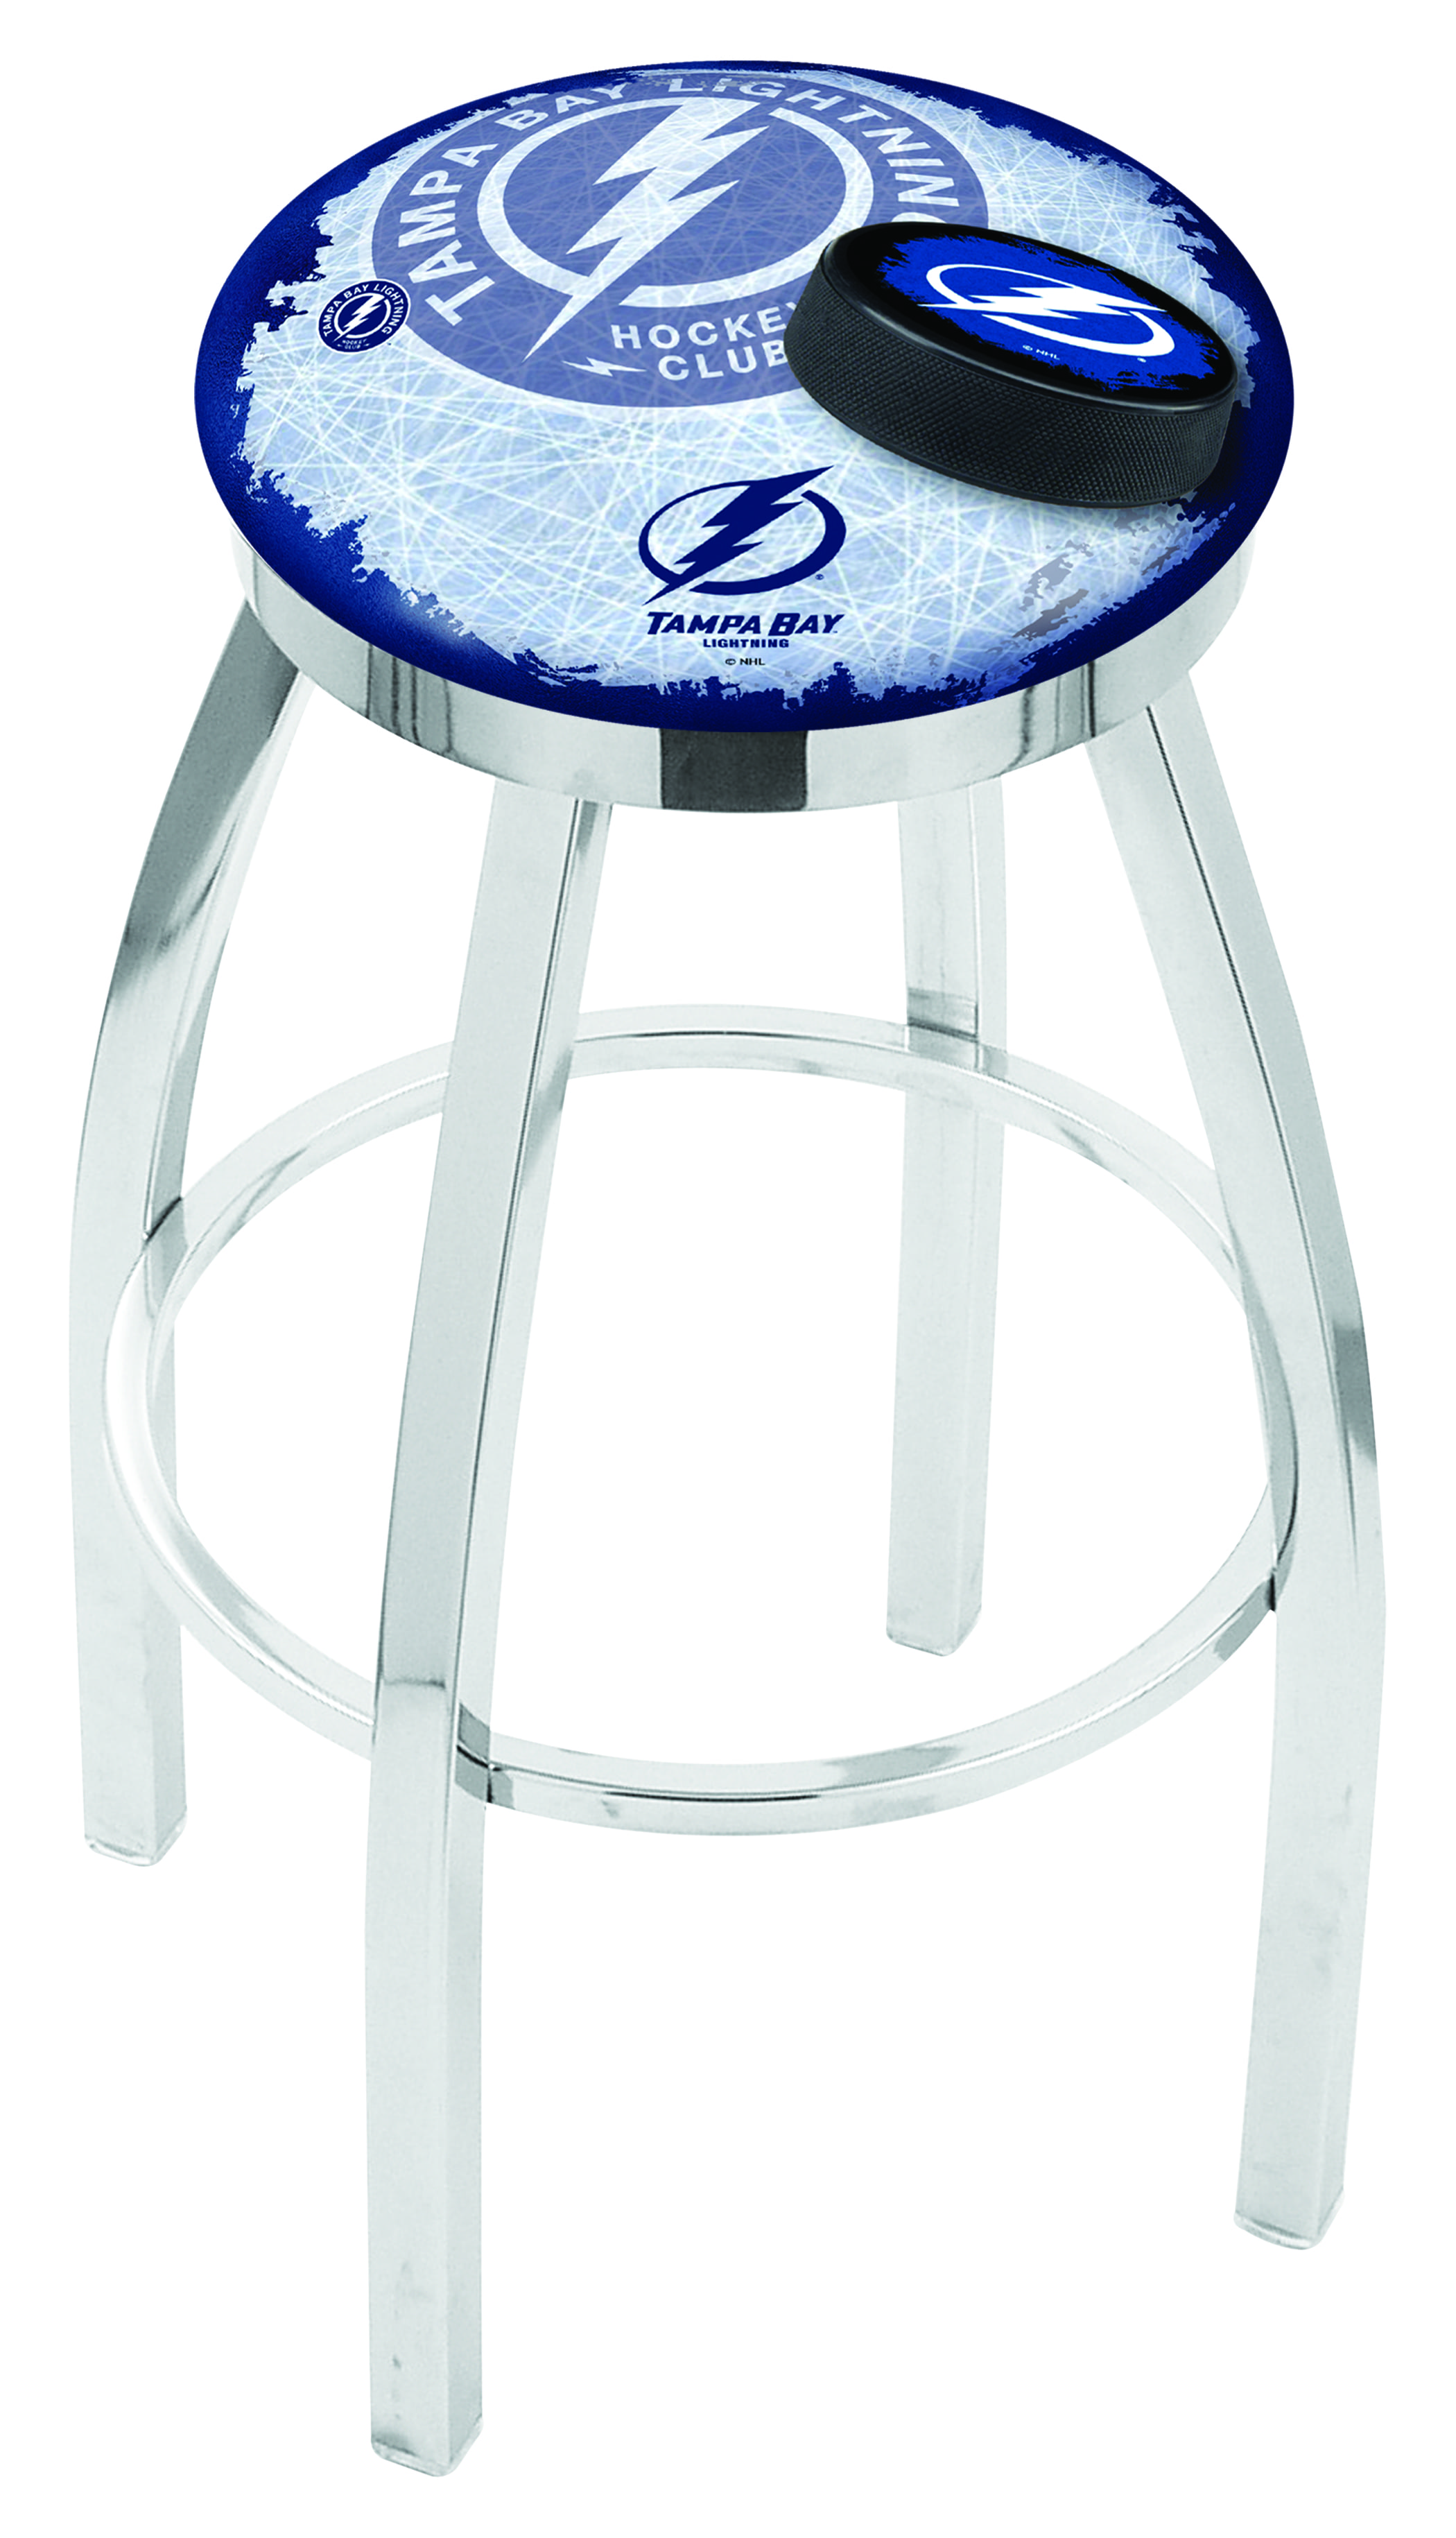 Tampa Bay Lightning Spectator Chair L8c2c